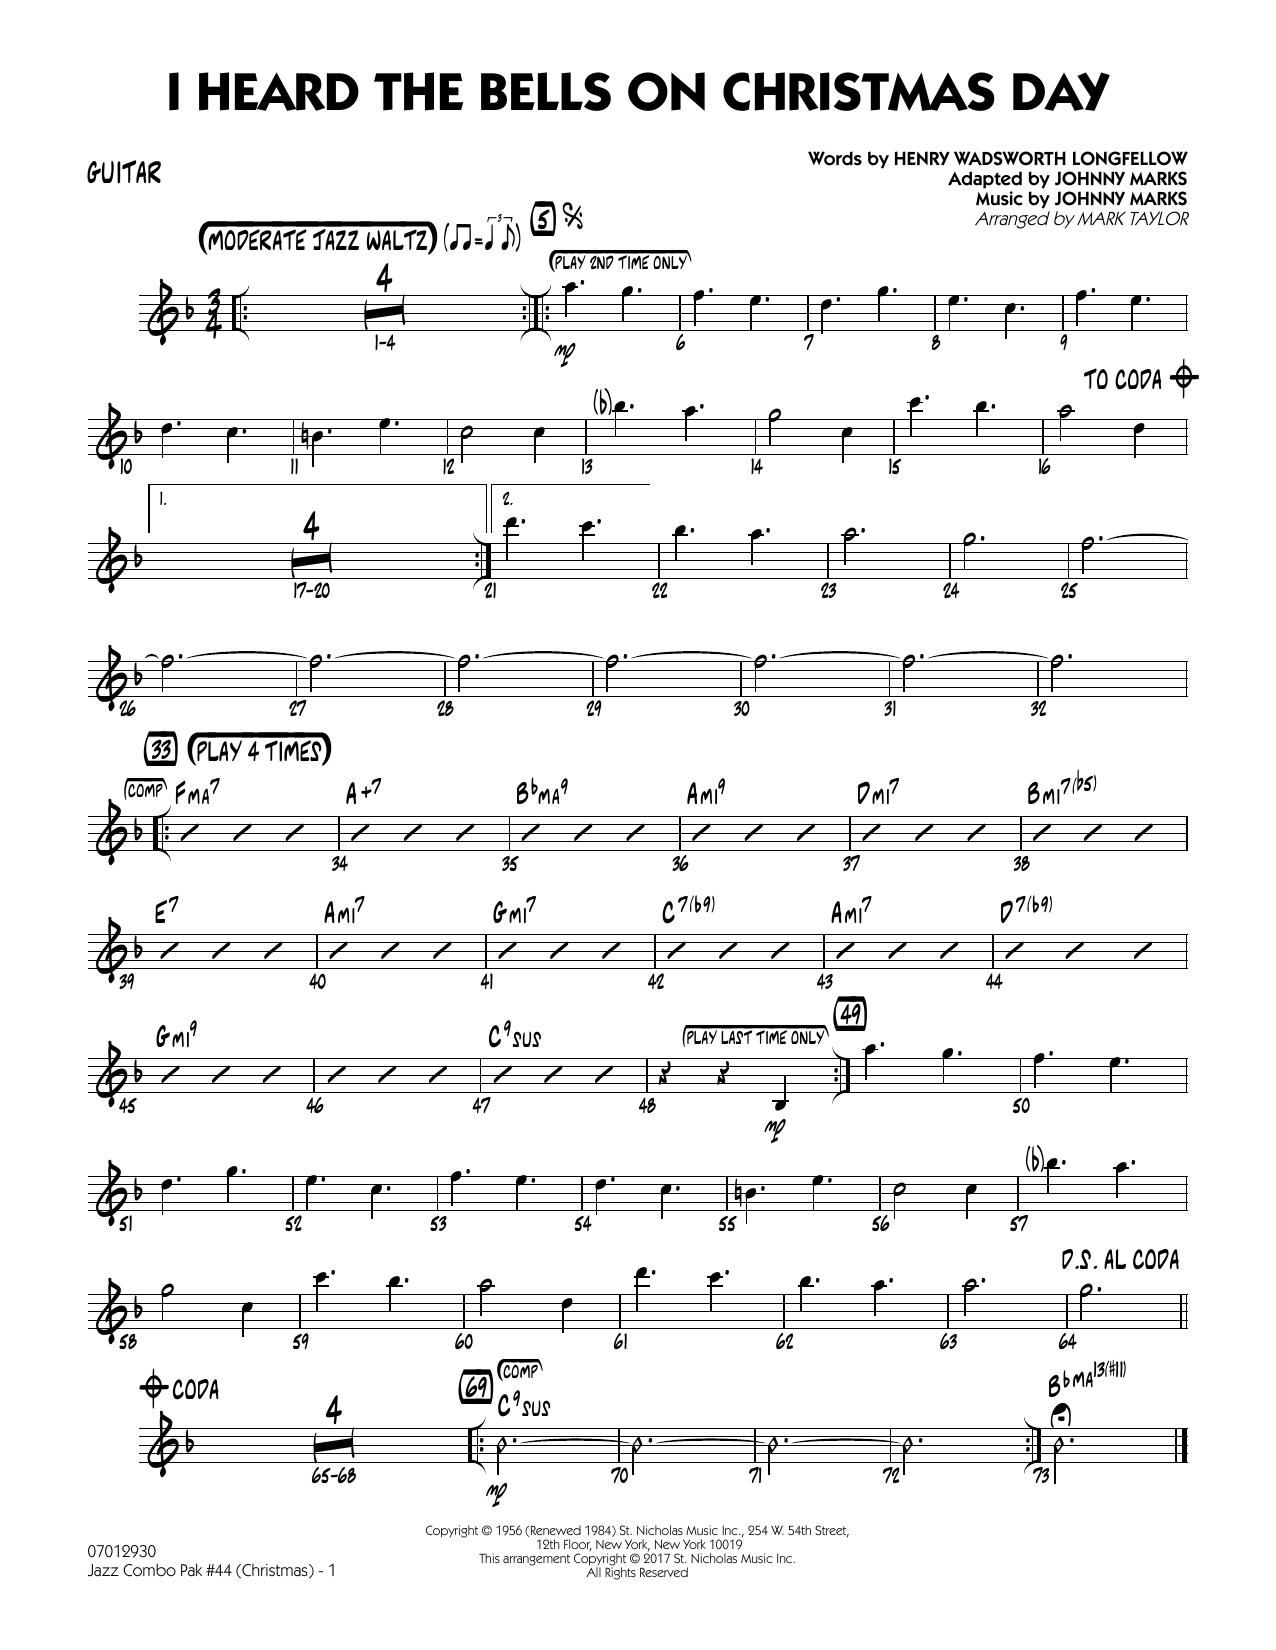 Mark Taylor Jazz Combo Pak #44 (Christmas) - Guitar sheet music notes and chords. Download Printable PDF.